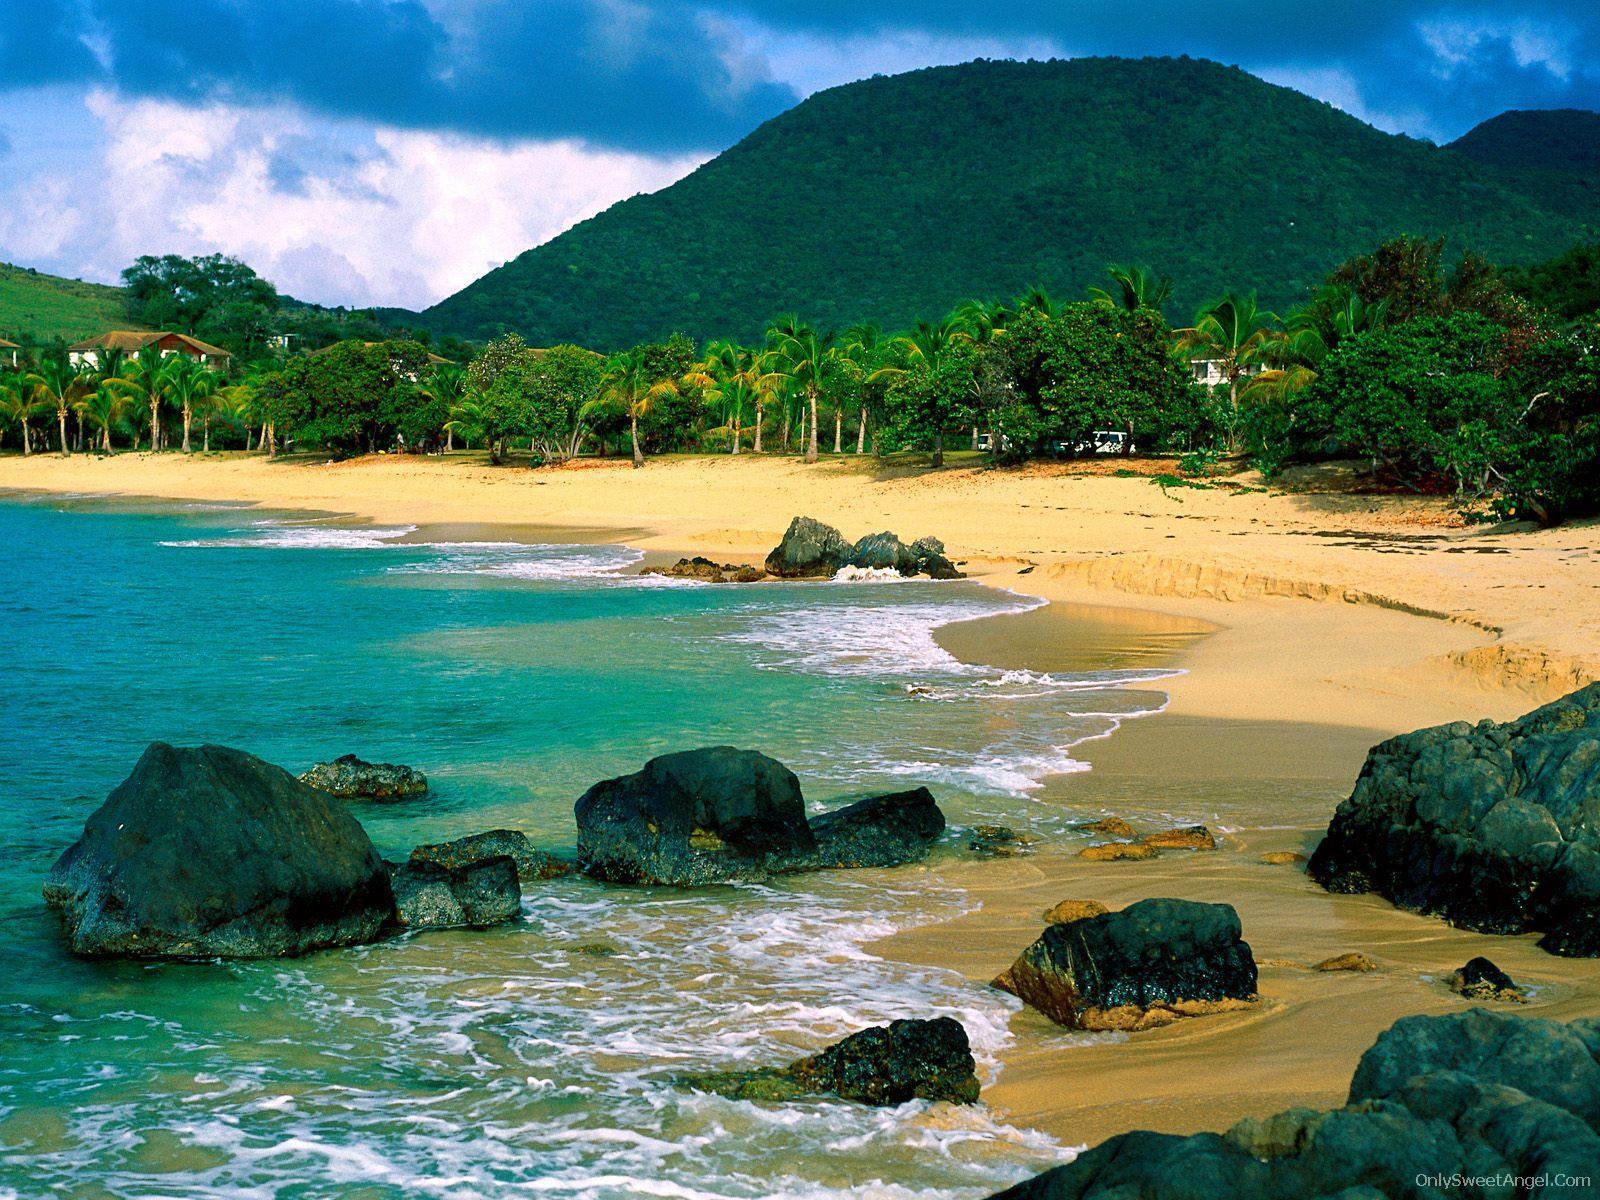 http://2.bp.blogspot.com/-Vy44ZU9c0io/T9gZbkcePcI/AAAAAAAAAgw/1sFI4B-xe0I/s1600/Beach+HD+nature+wallpaper.jpg